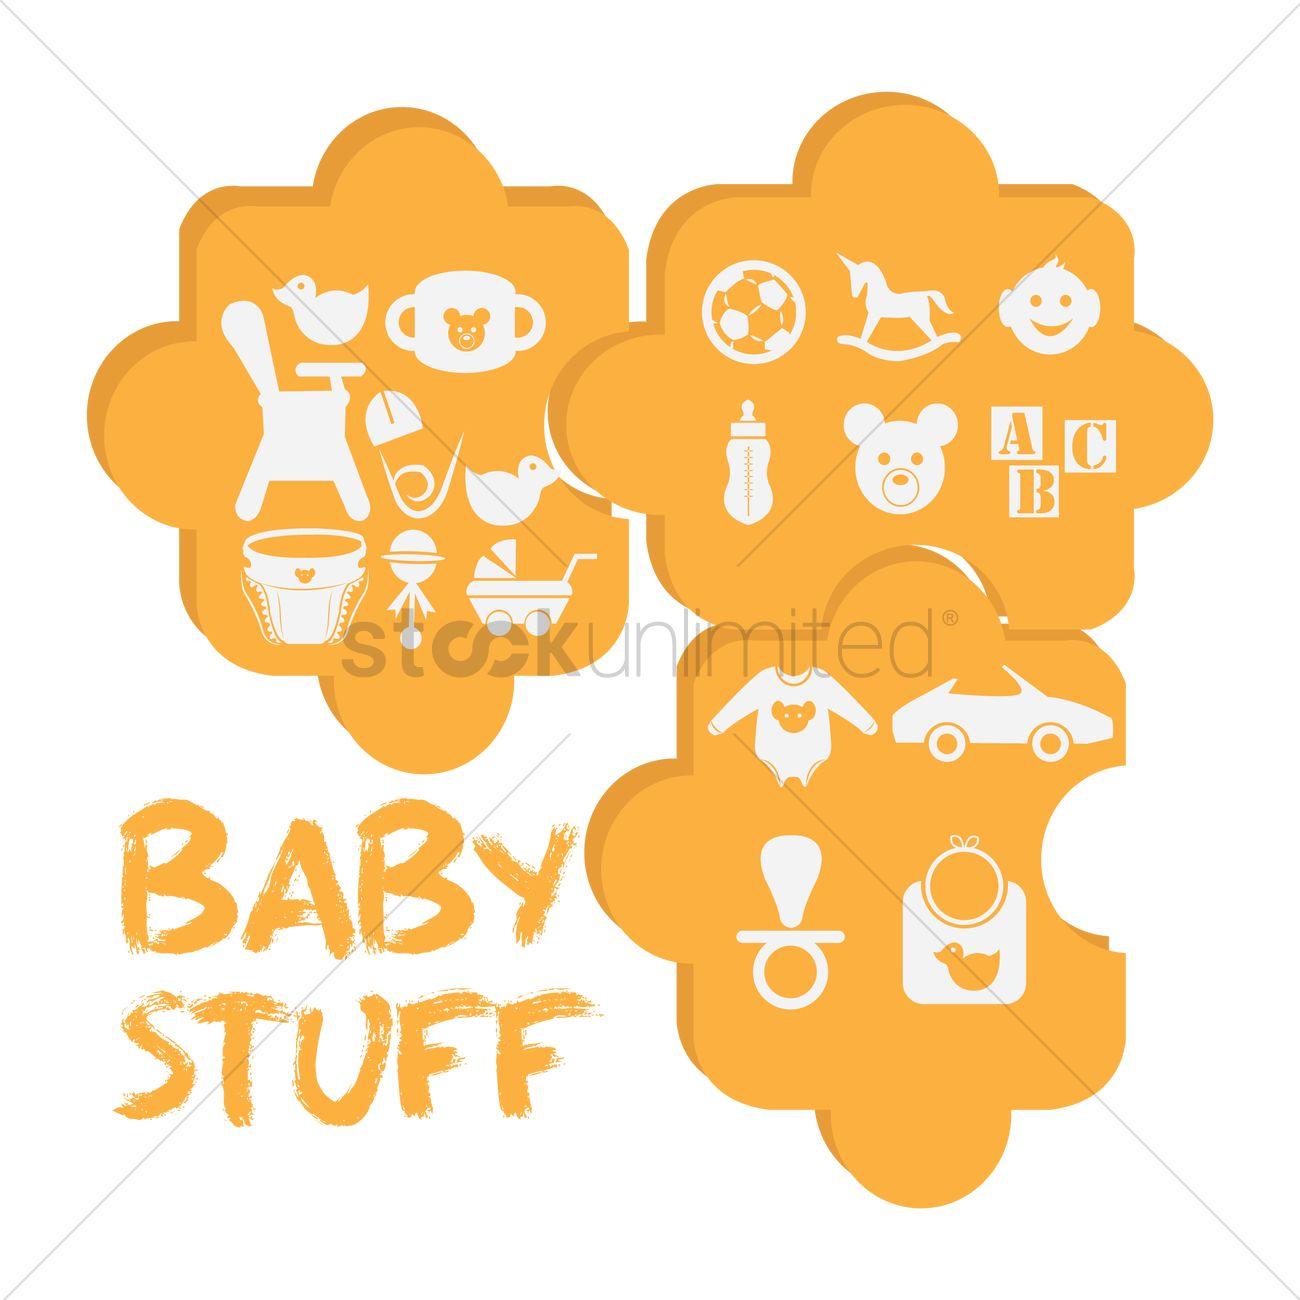 1300x1300 Baby Stuff Vector Image